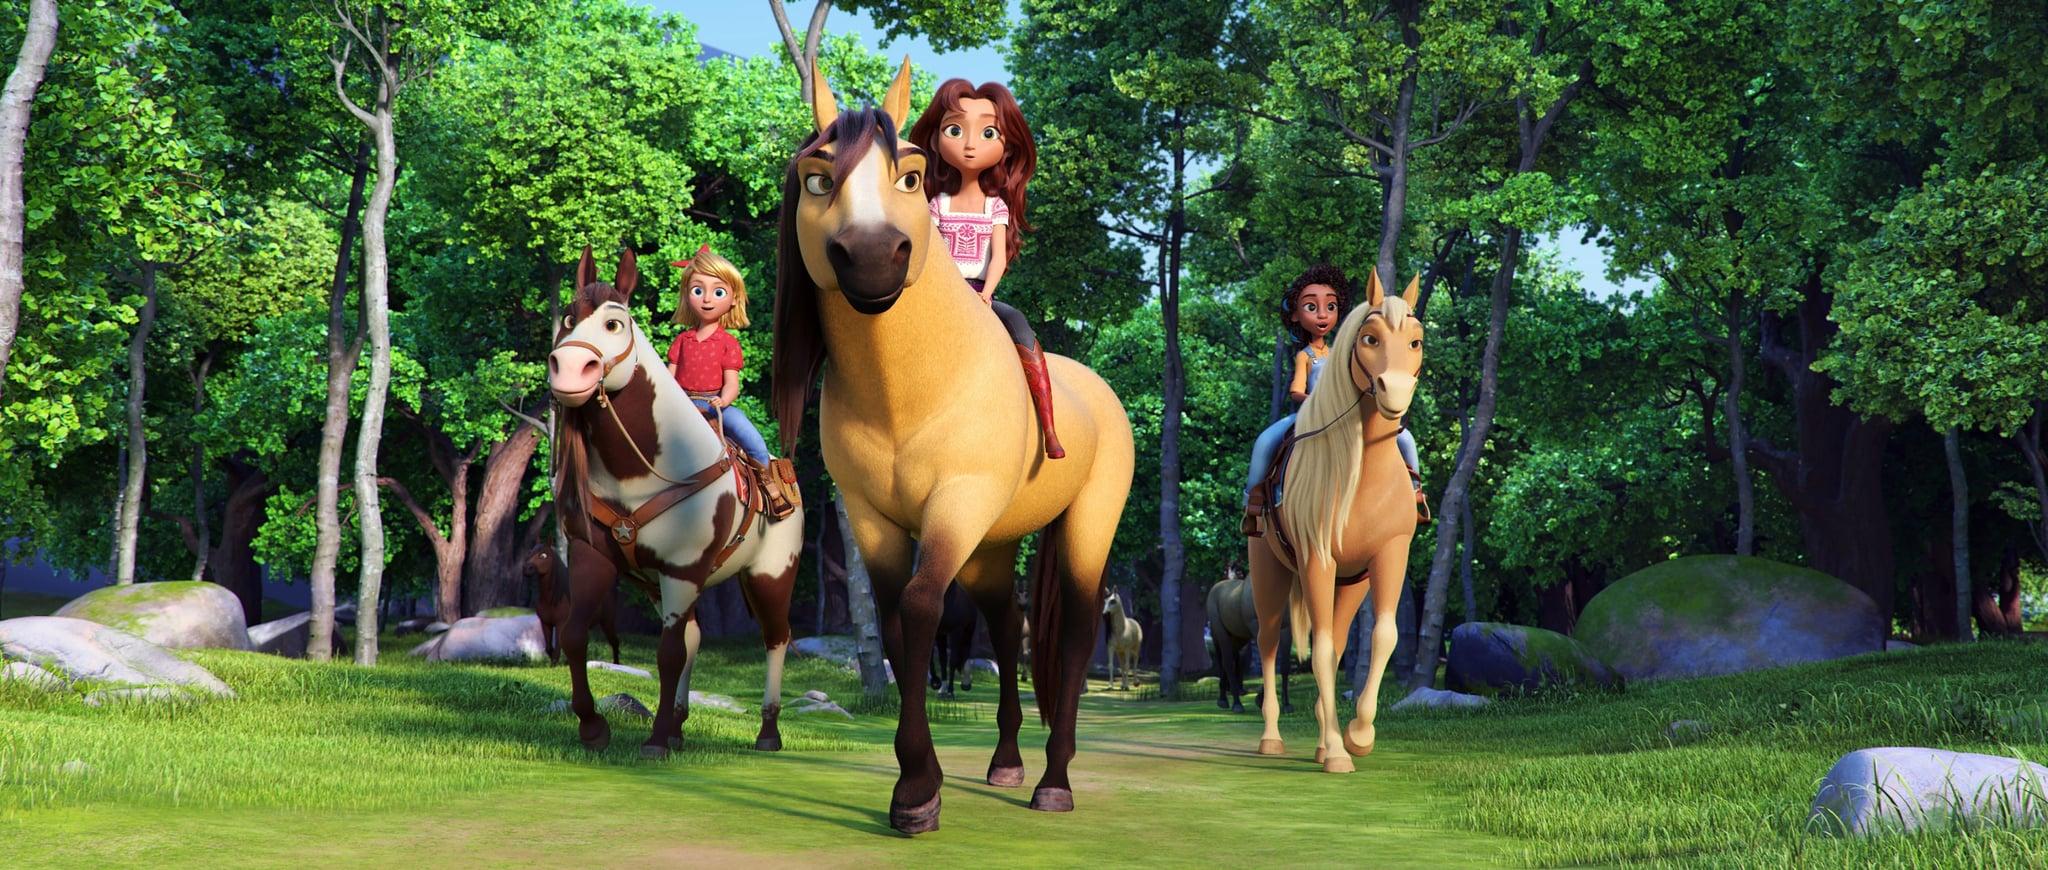 SPIRIT UNTAMED, from left: Abigail Stone (voice: Mckenna Grace) riding Boomerang, Lucky Prescott (voice: Isabela Merced) riding Spirit, Pru Granger (voice: Marsai Martin) riding Chica Linda, 2021.  Universal / courtesy Everett Collection